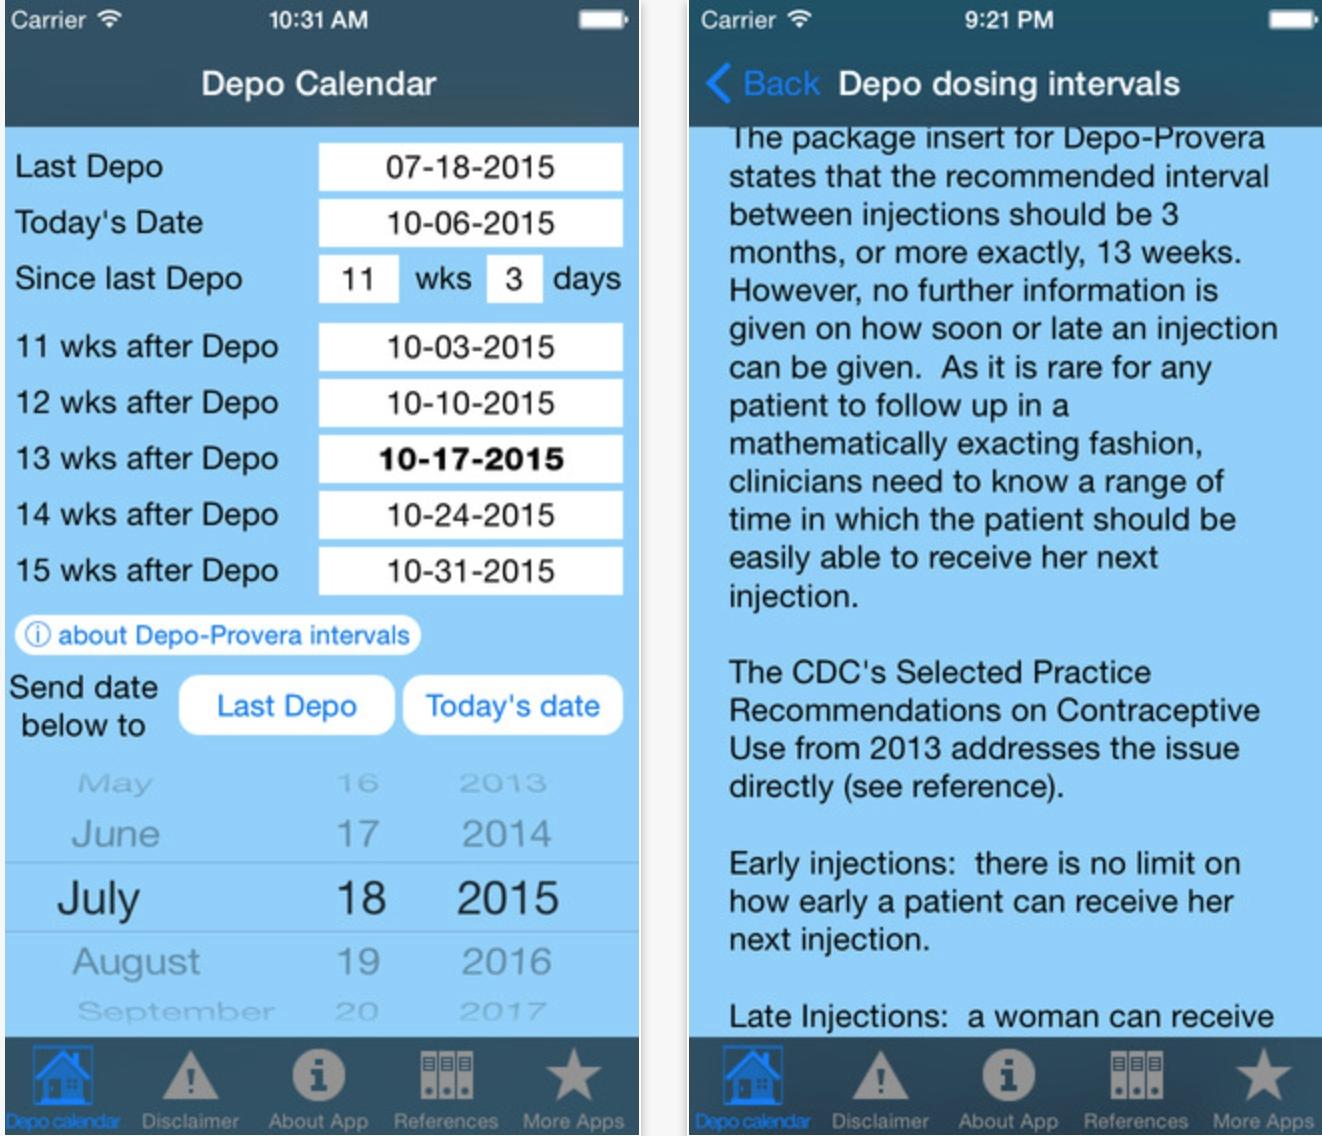 Depo Calendar App Could Significantly Improve Contraception  Depo Provera Calendar